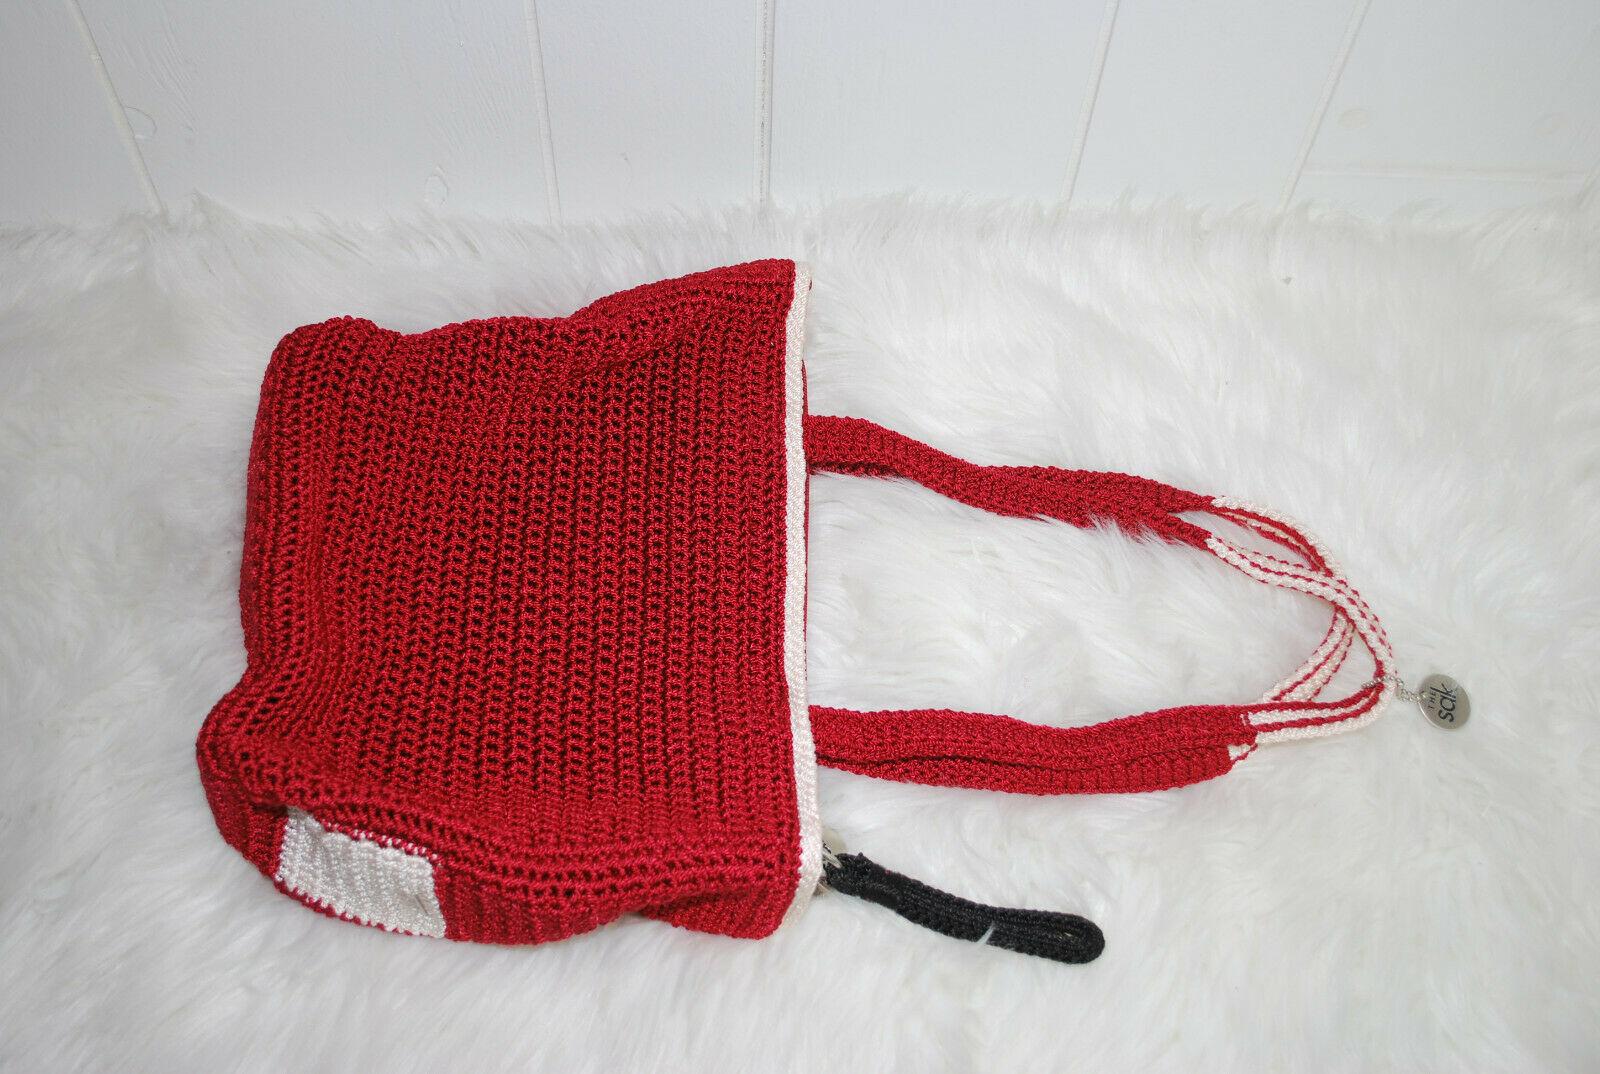 The Sak Womens Handbag Purse Shoulder Bag Crimson Red White Black Keychain Boho